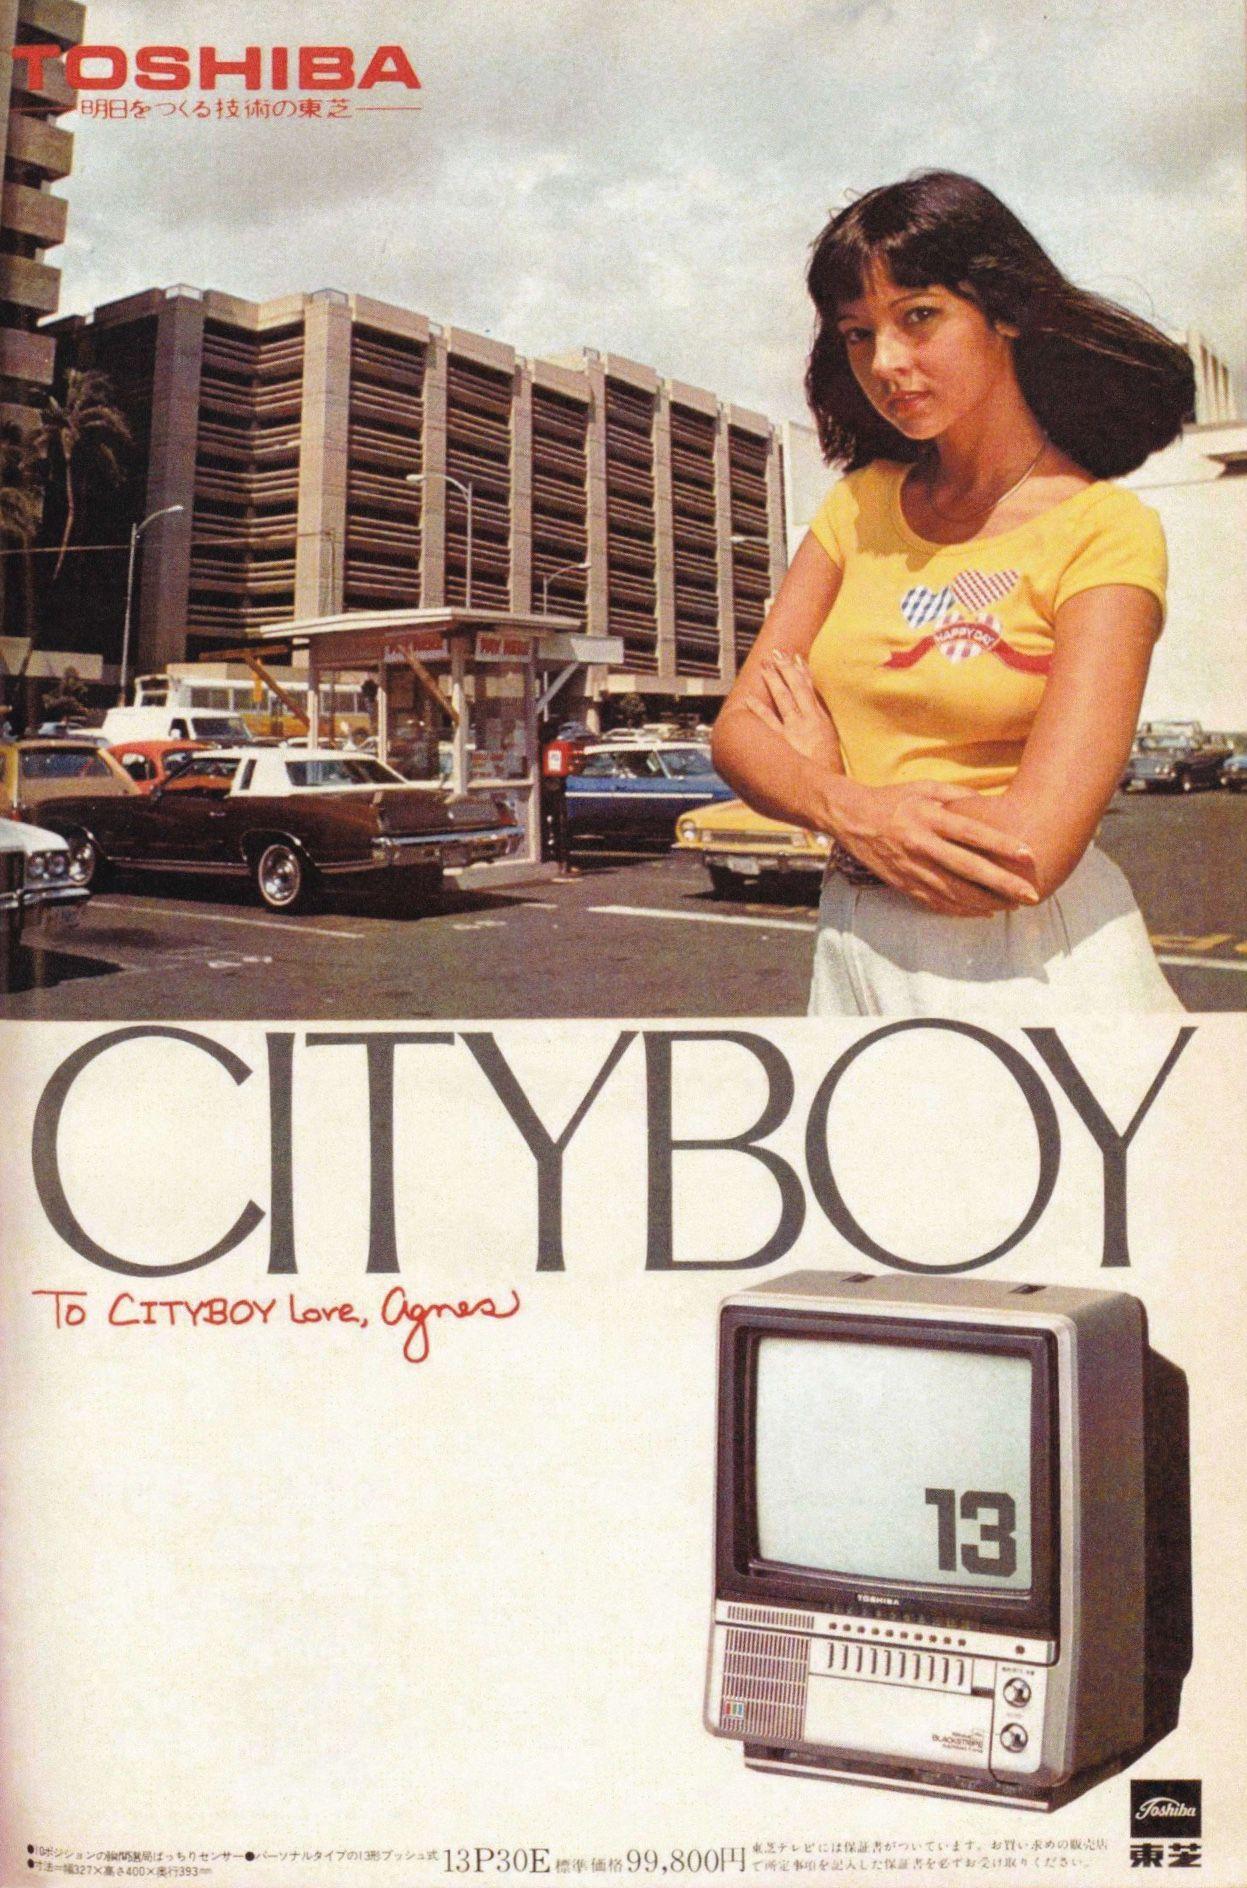 Discussion on this topic: Ryoko Shinohara, hailey-clauson/